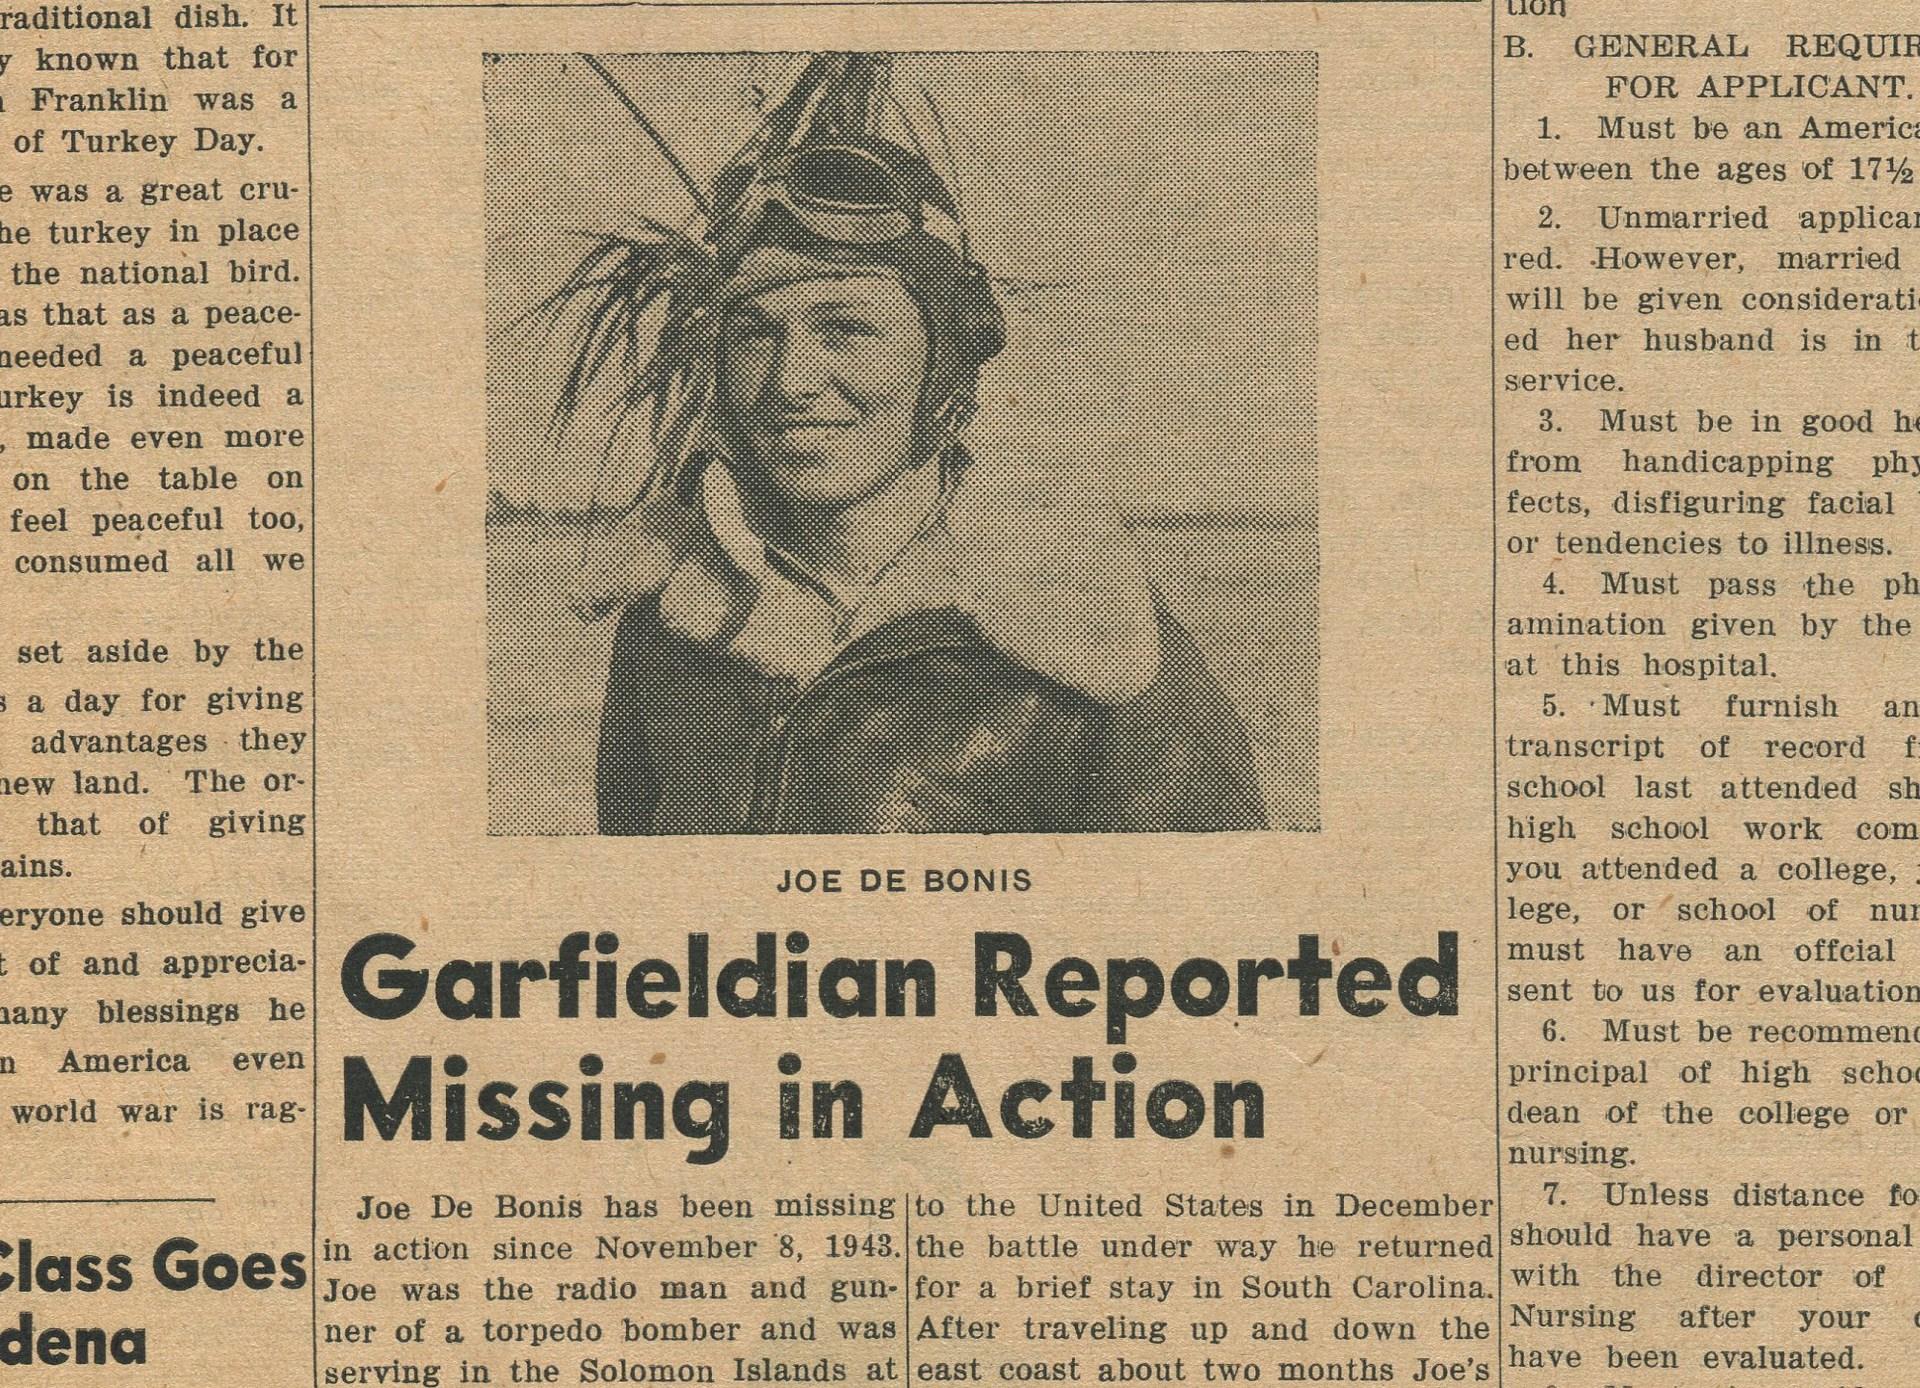 Garfieldian missing in action